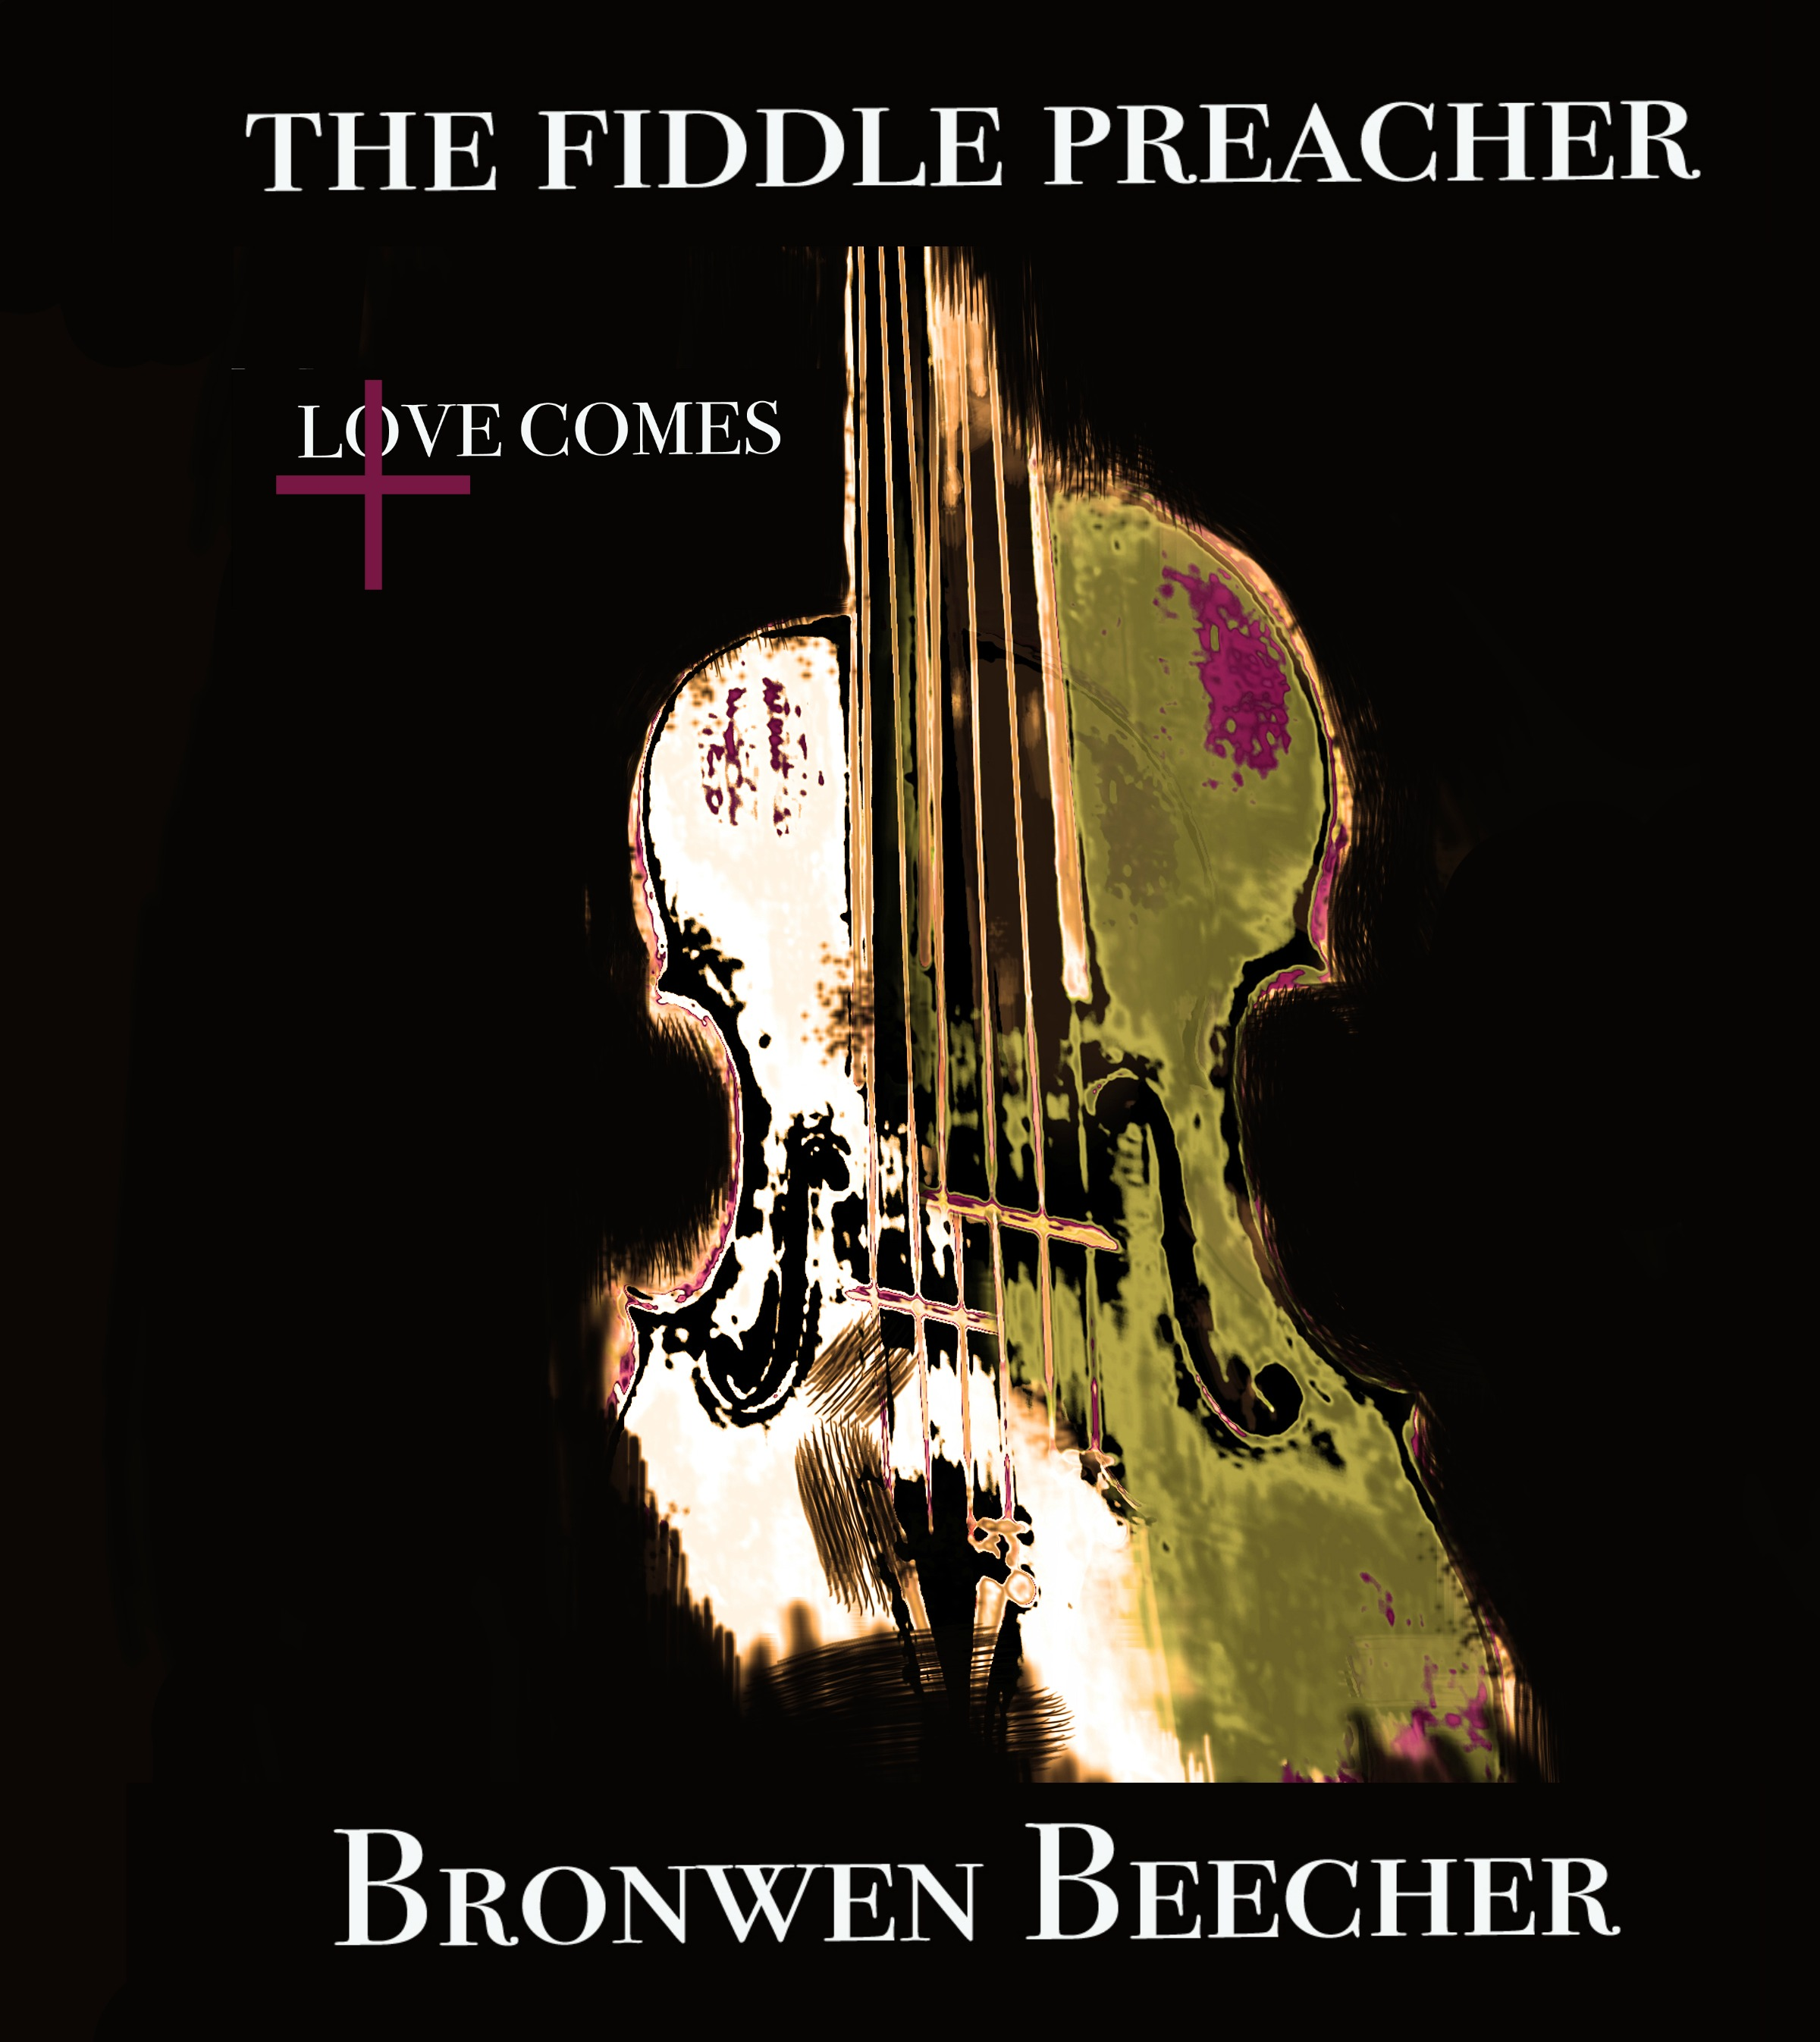 Bronwen Beecher album cover for download